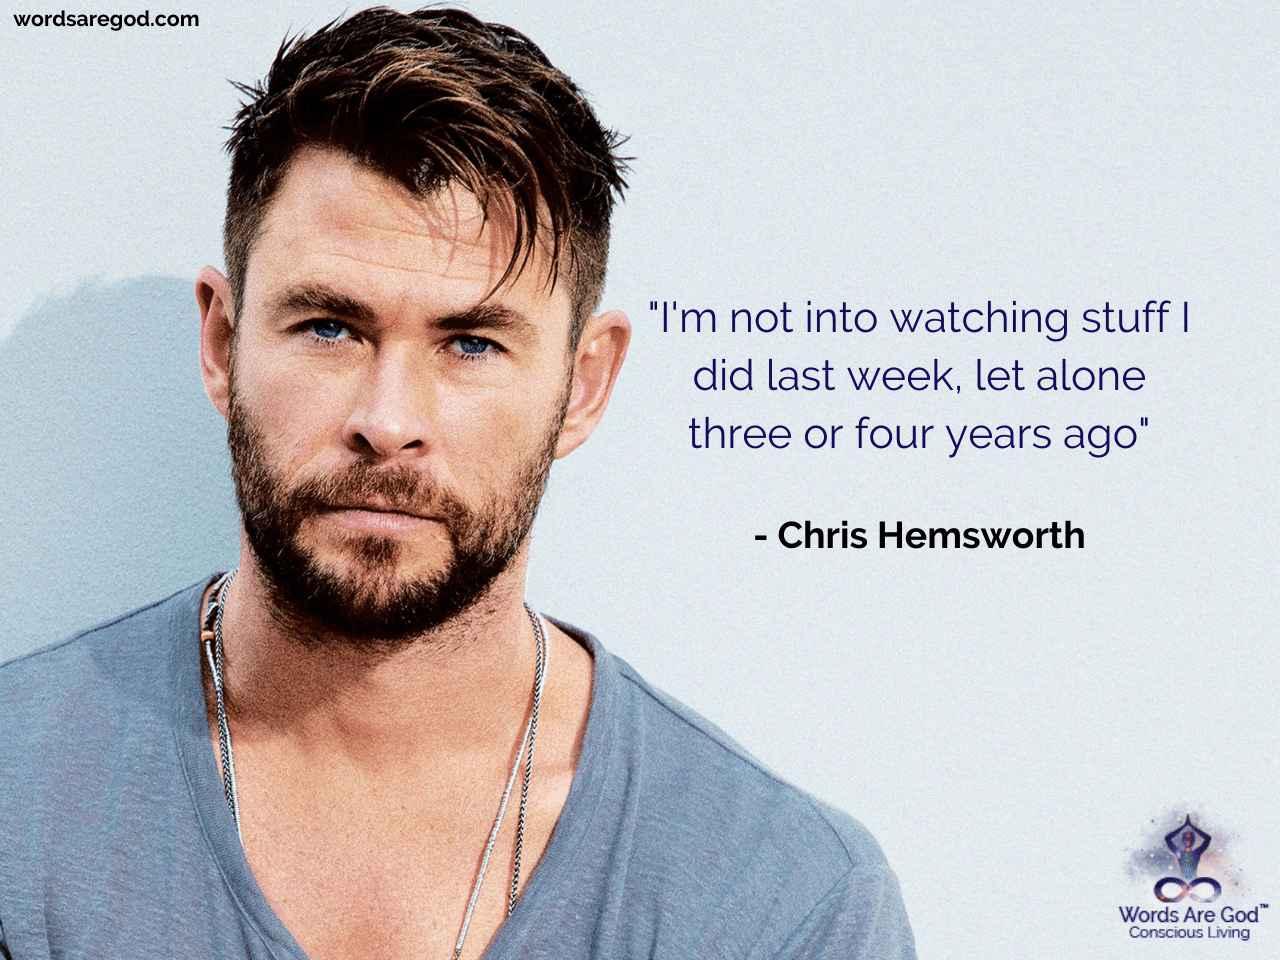 Chris Hemsworth Inspirational Quotes by Chris Hemsworth